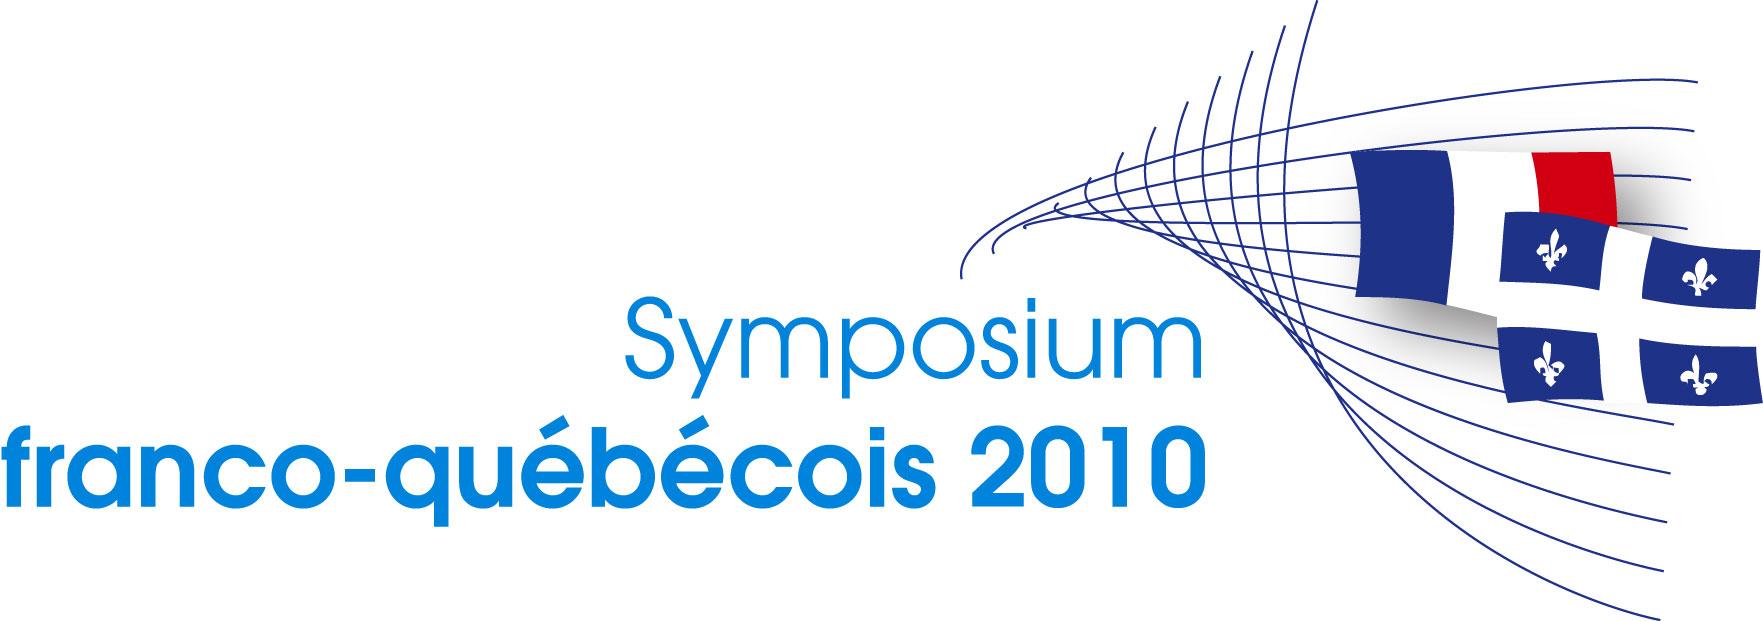 Symposium franco-quebecois 2010